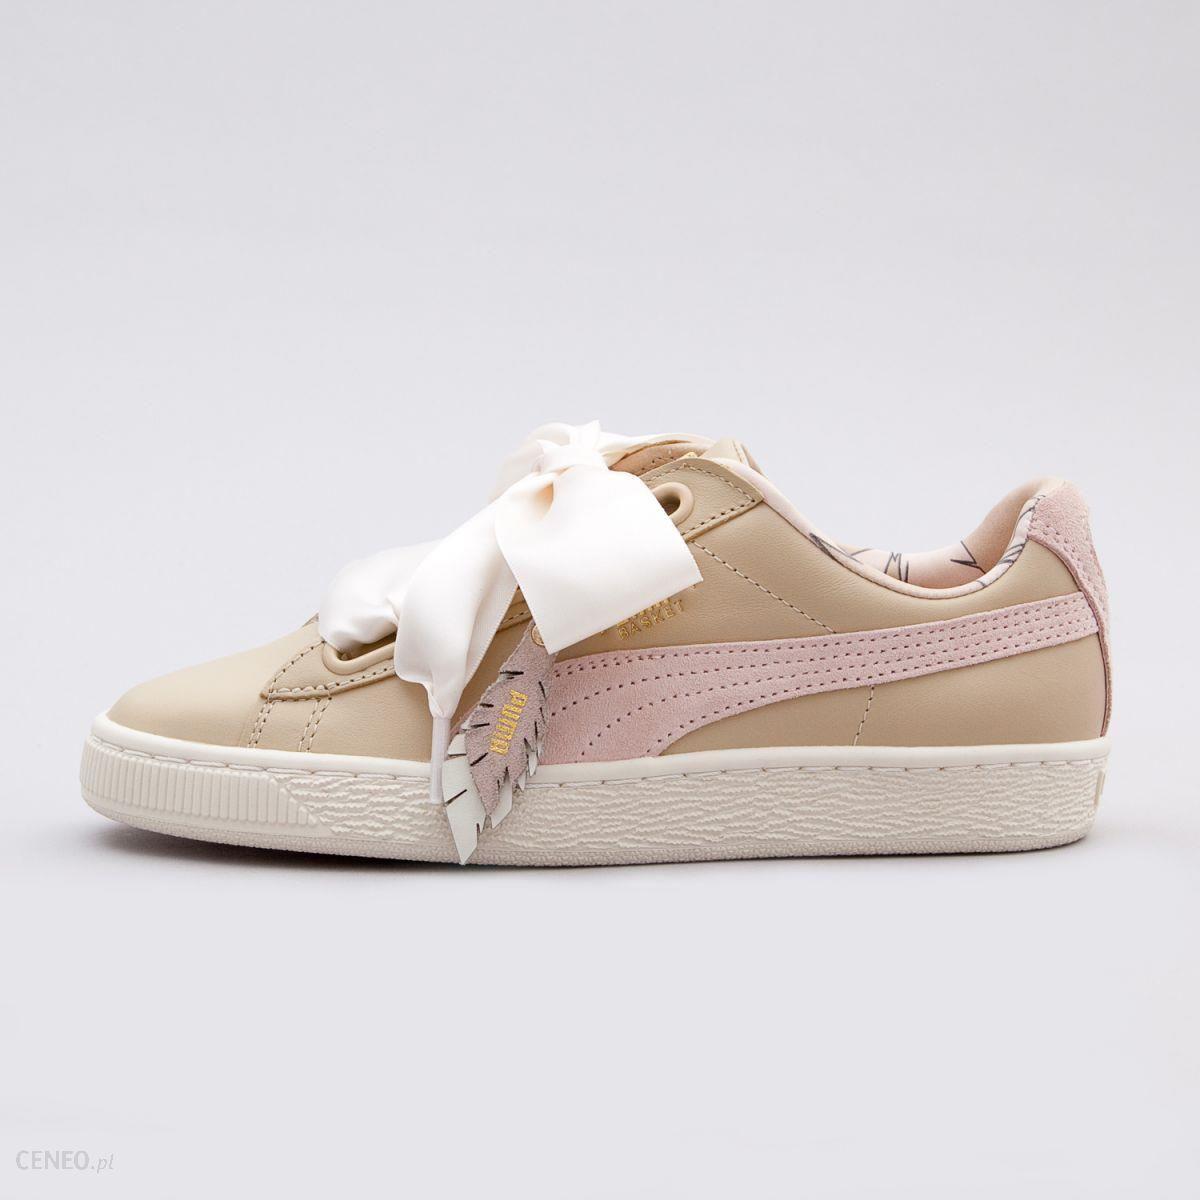 best sneakers d0c5a 2f9dc Puma BASKET HEART COACH WN'S 366366 01 - Ceny i opinie - Ceneo.pl